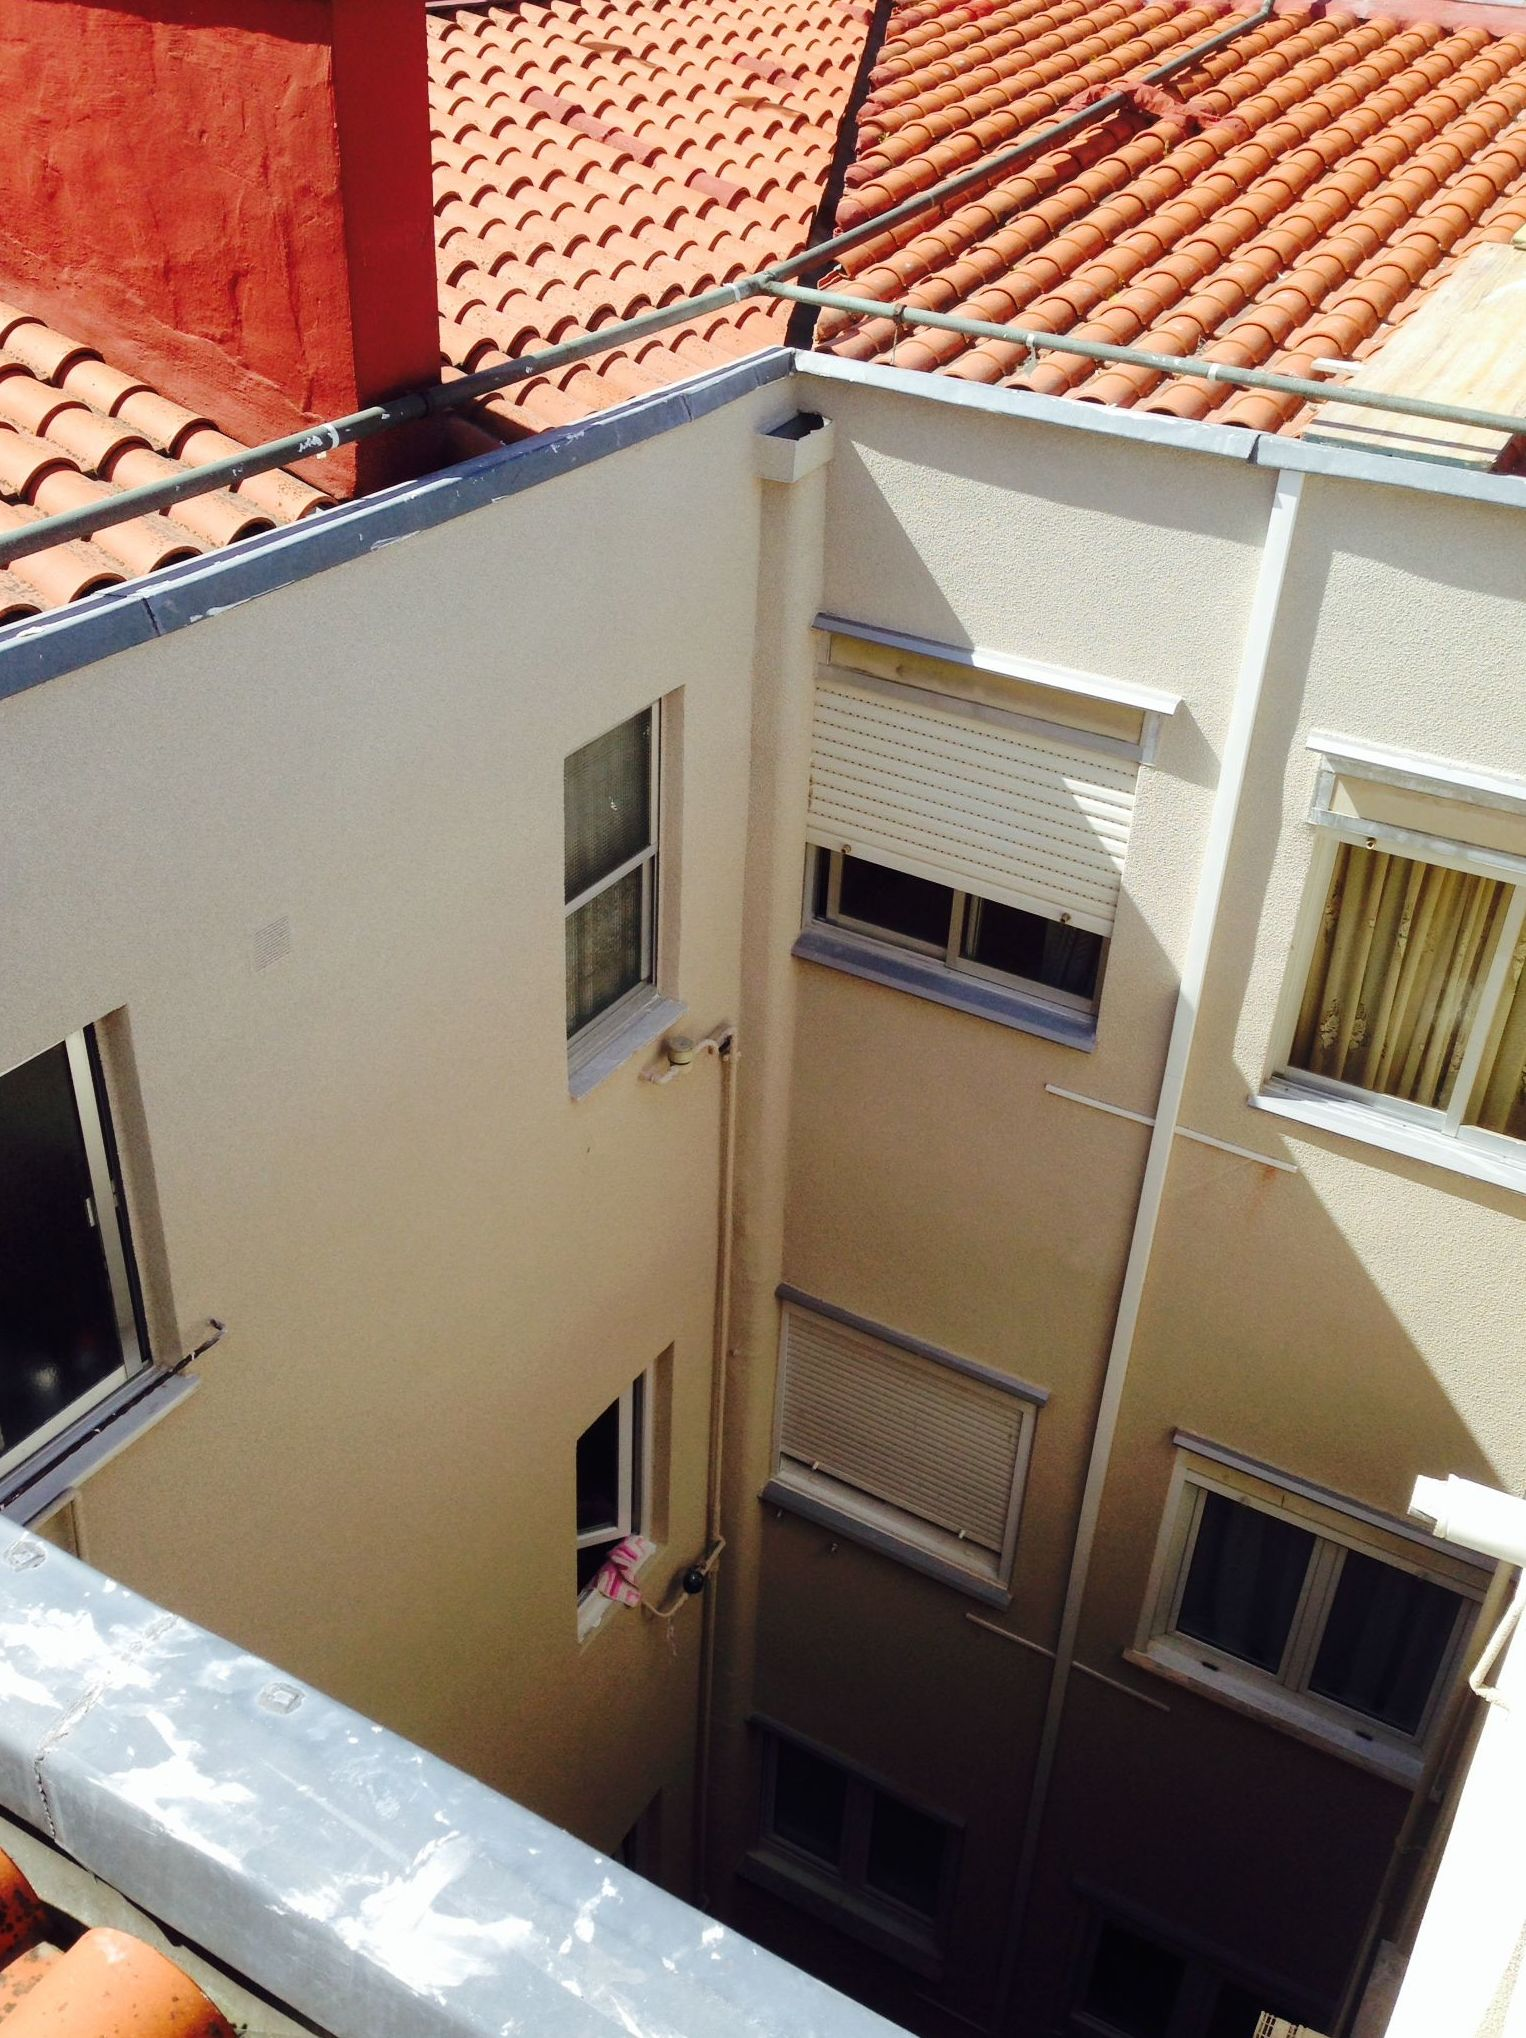 Fachadas exteriores, patios, traseras, principal, medianiles reparación impermeabilización